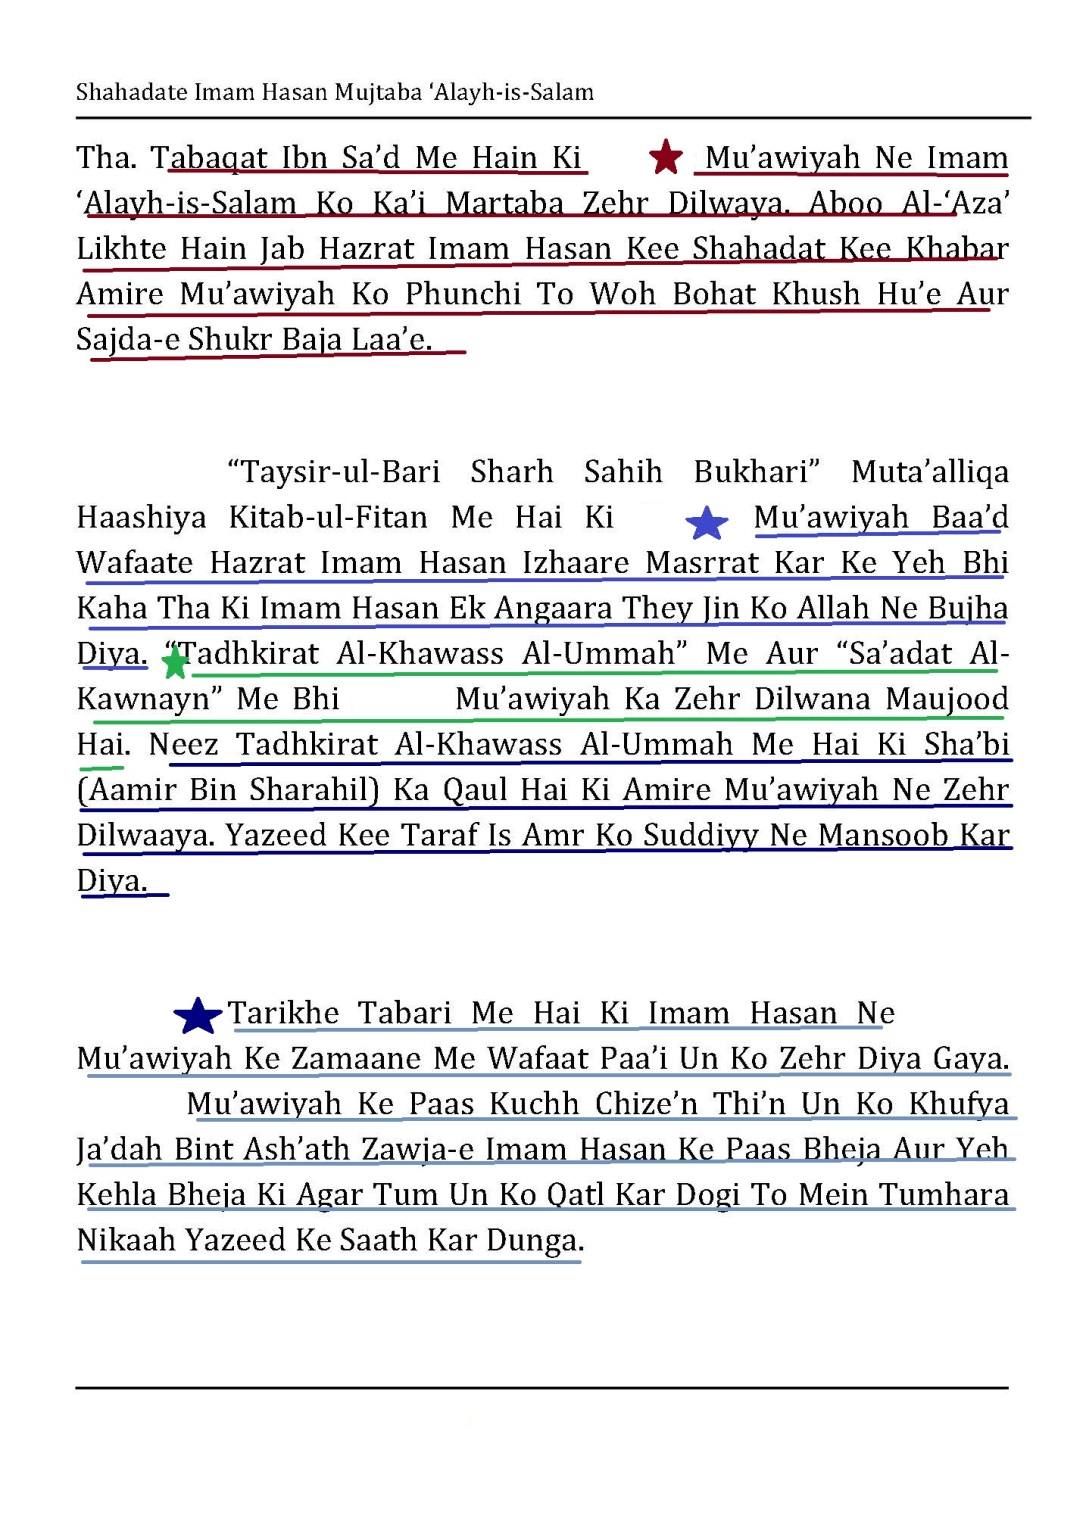 shahadate-imam-hasan-mujtaba-e28098alayh-is-salam-pdf_unlocked_Page_14